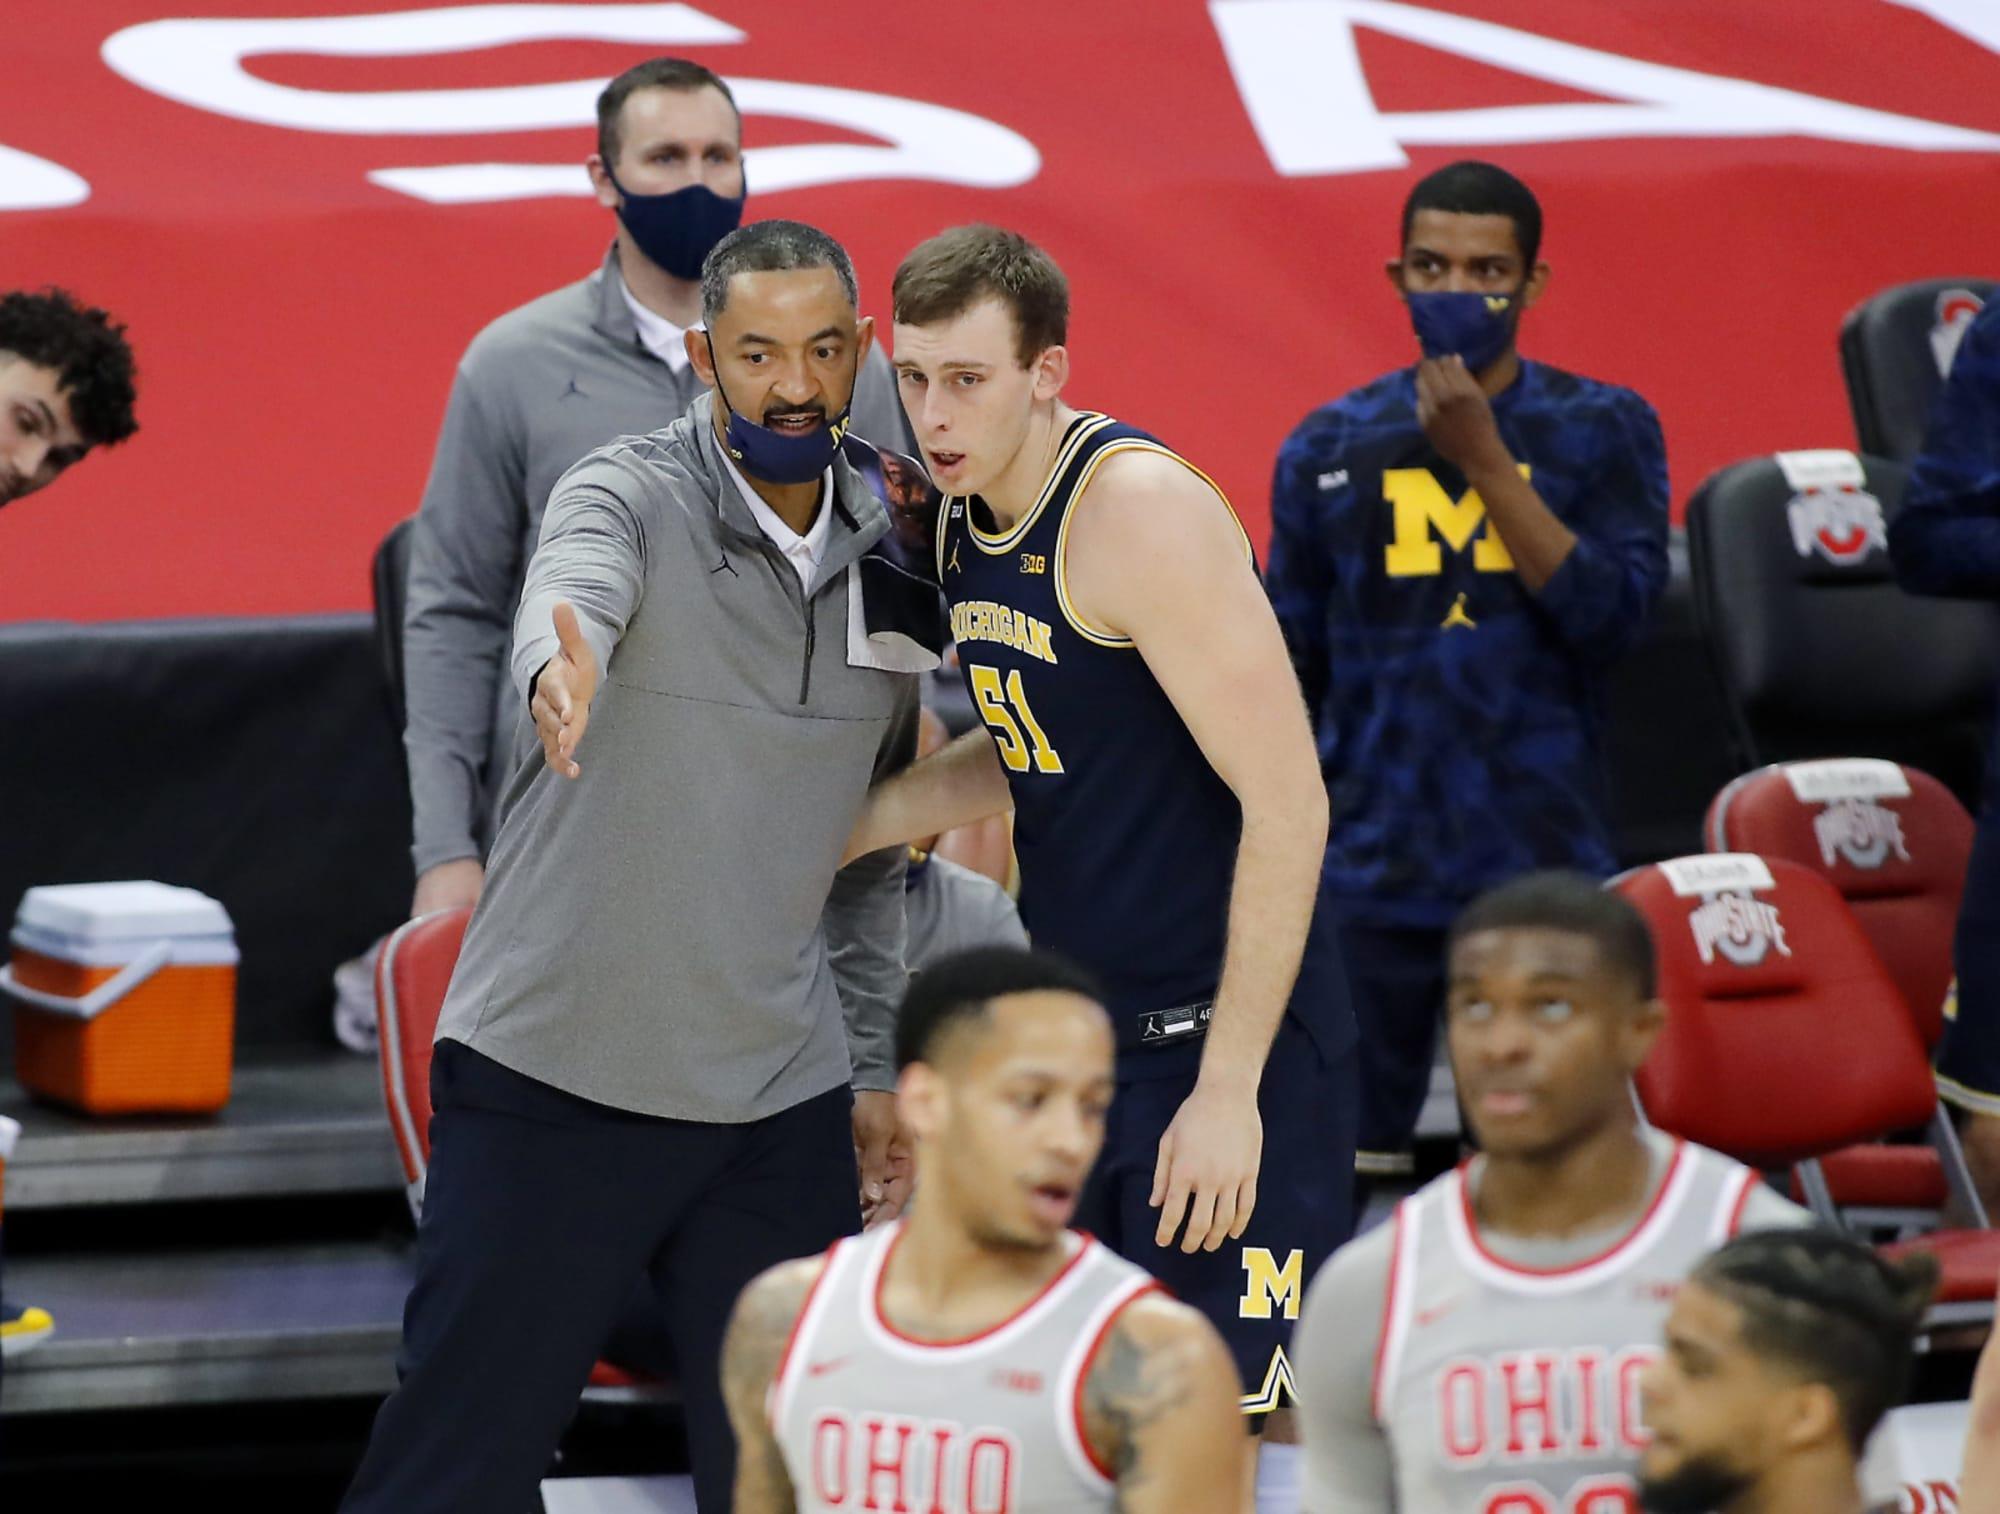 Michigan Basketball: Juwan Howard gives Wolverines edge with 2022 big man - GBMWolverine